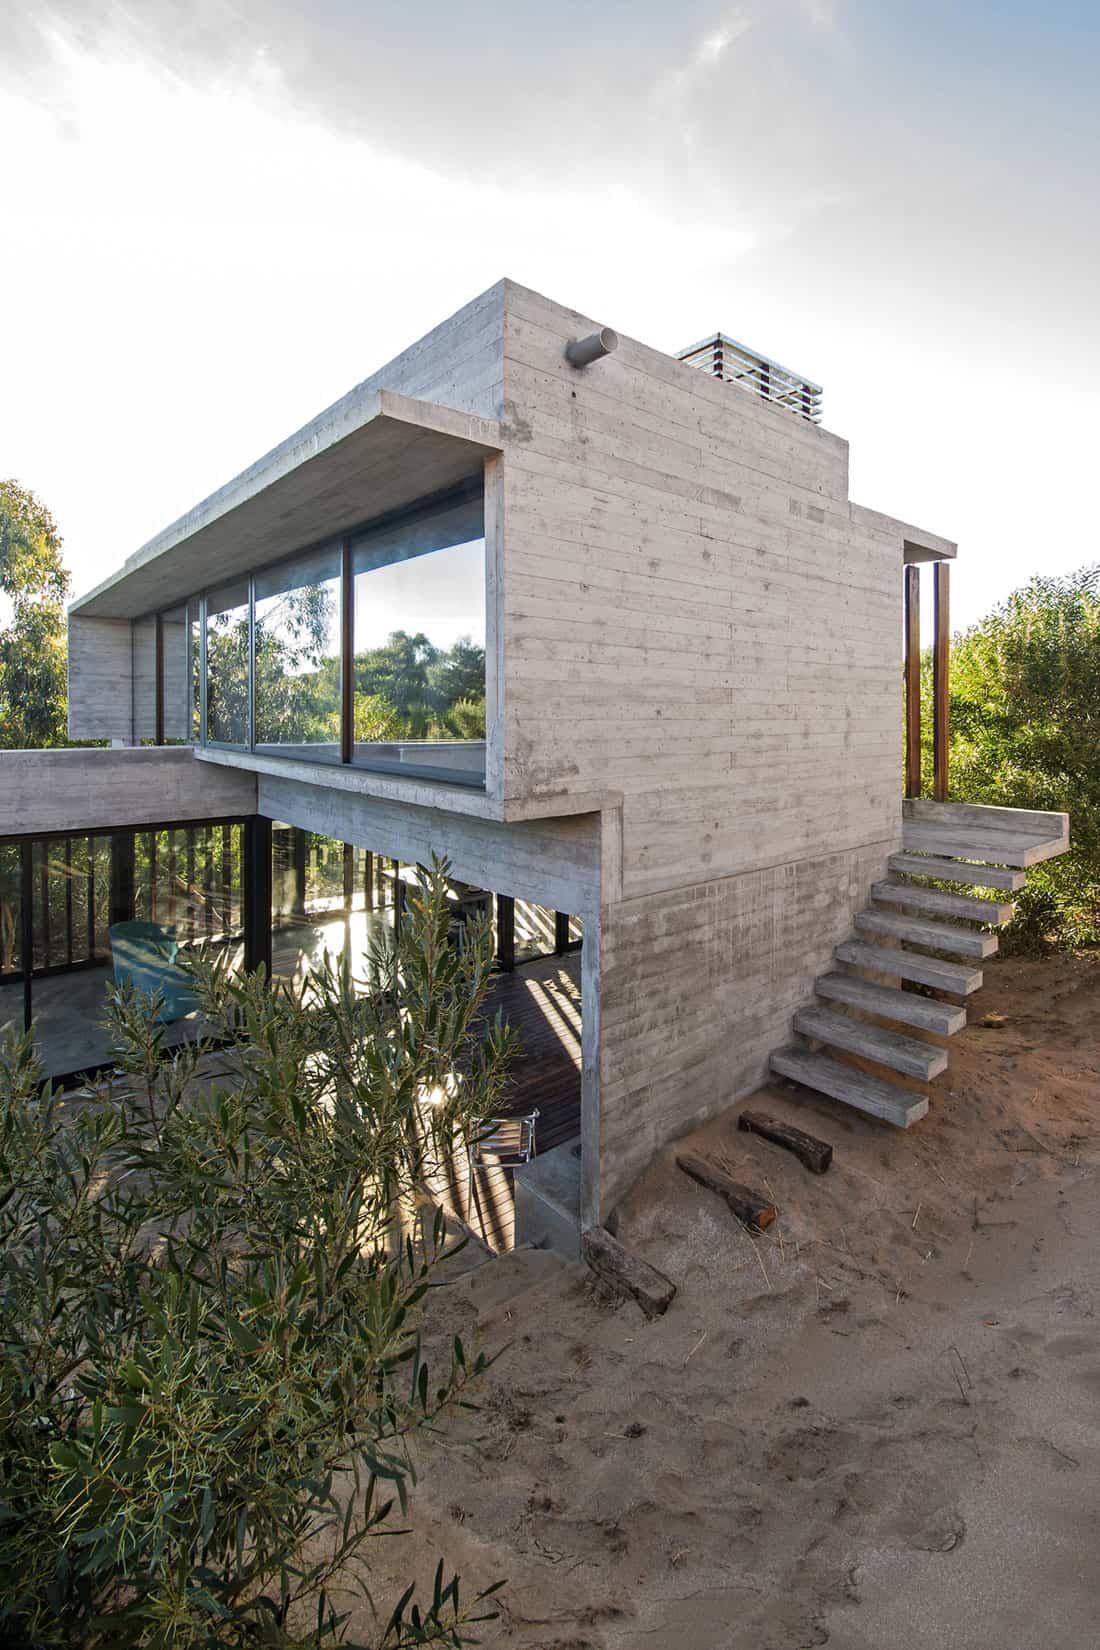 MR House by Luciano Kruk Arquitectos (9)